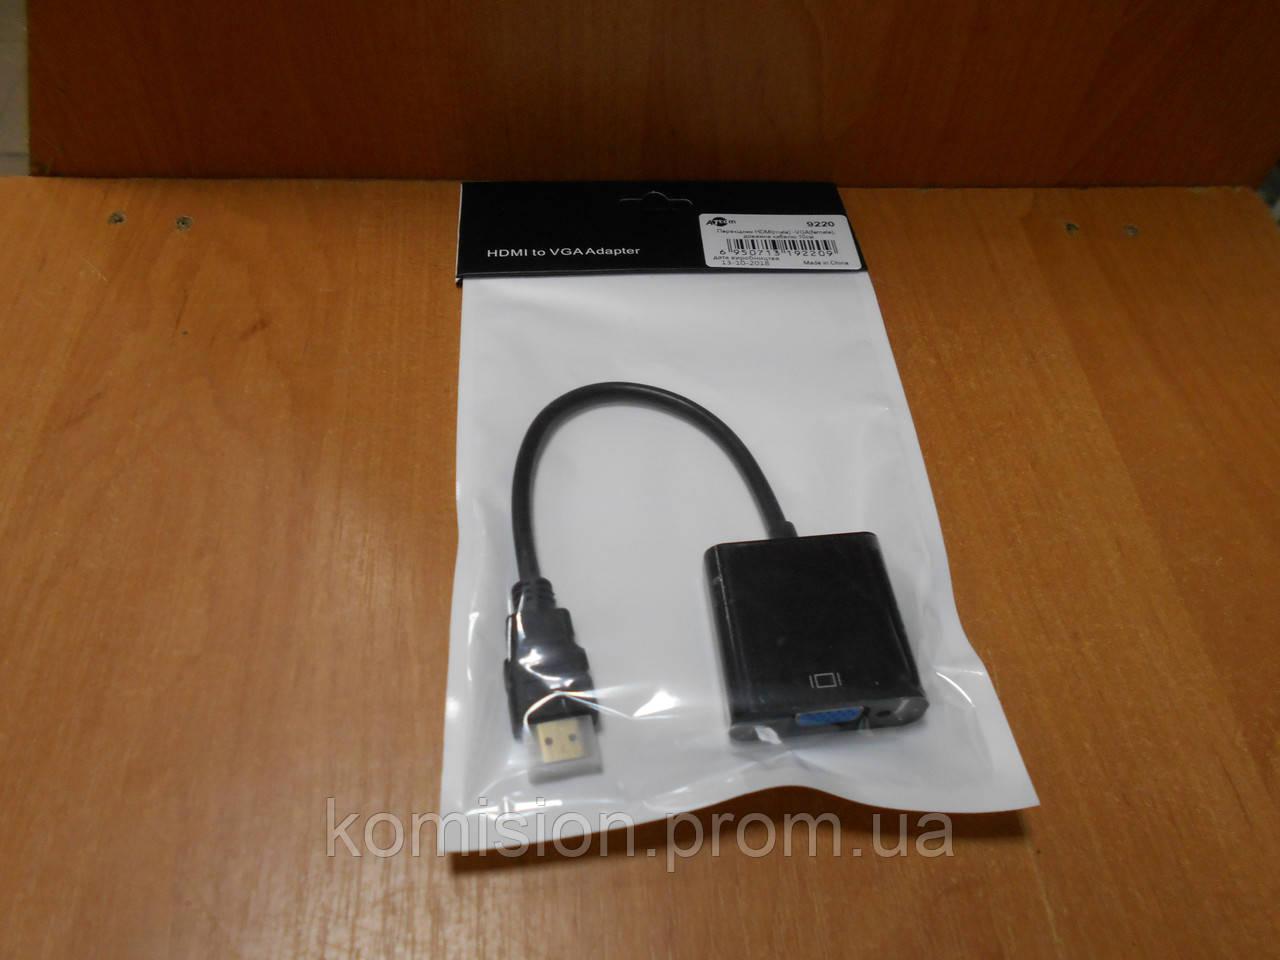 Переходник HDMI to VGA